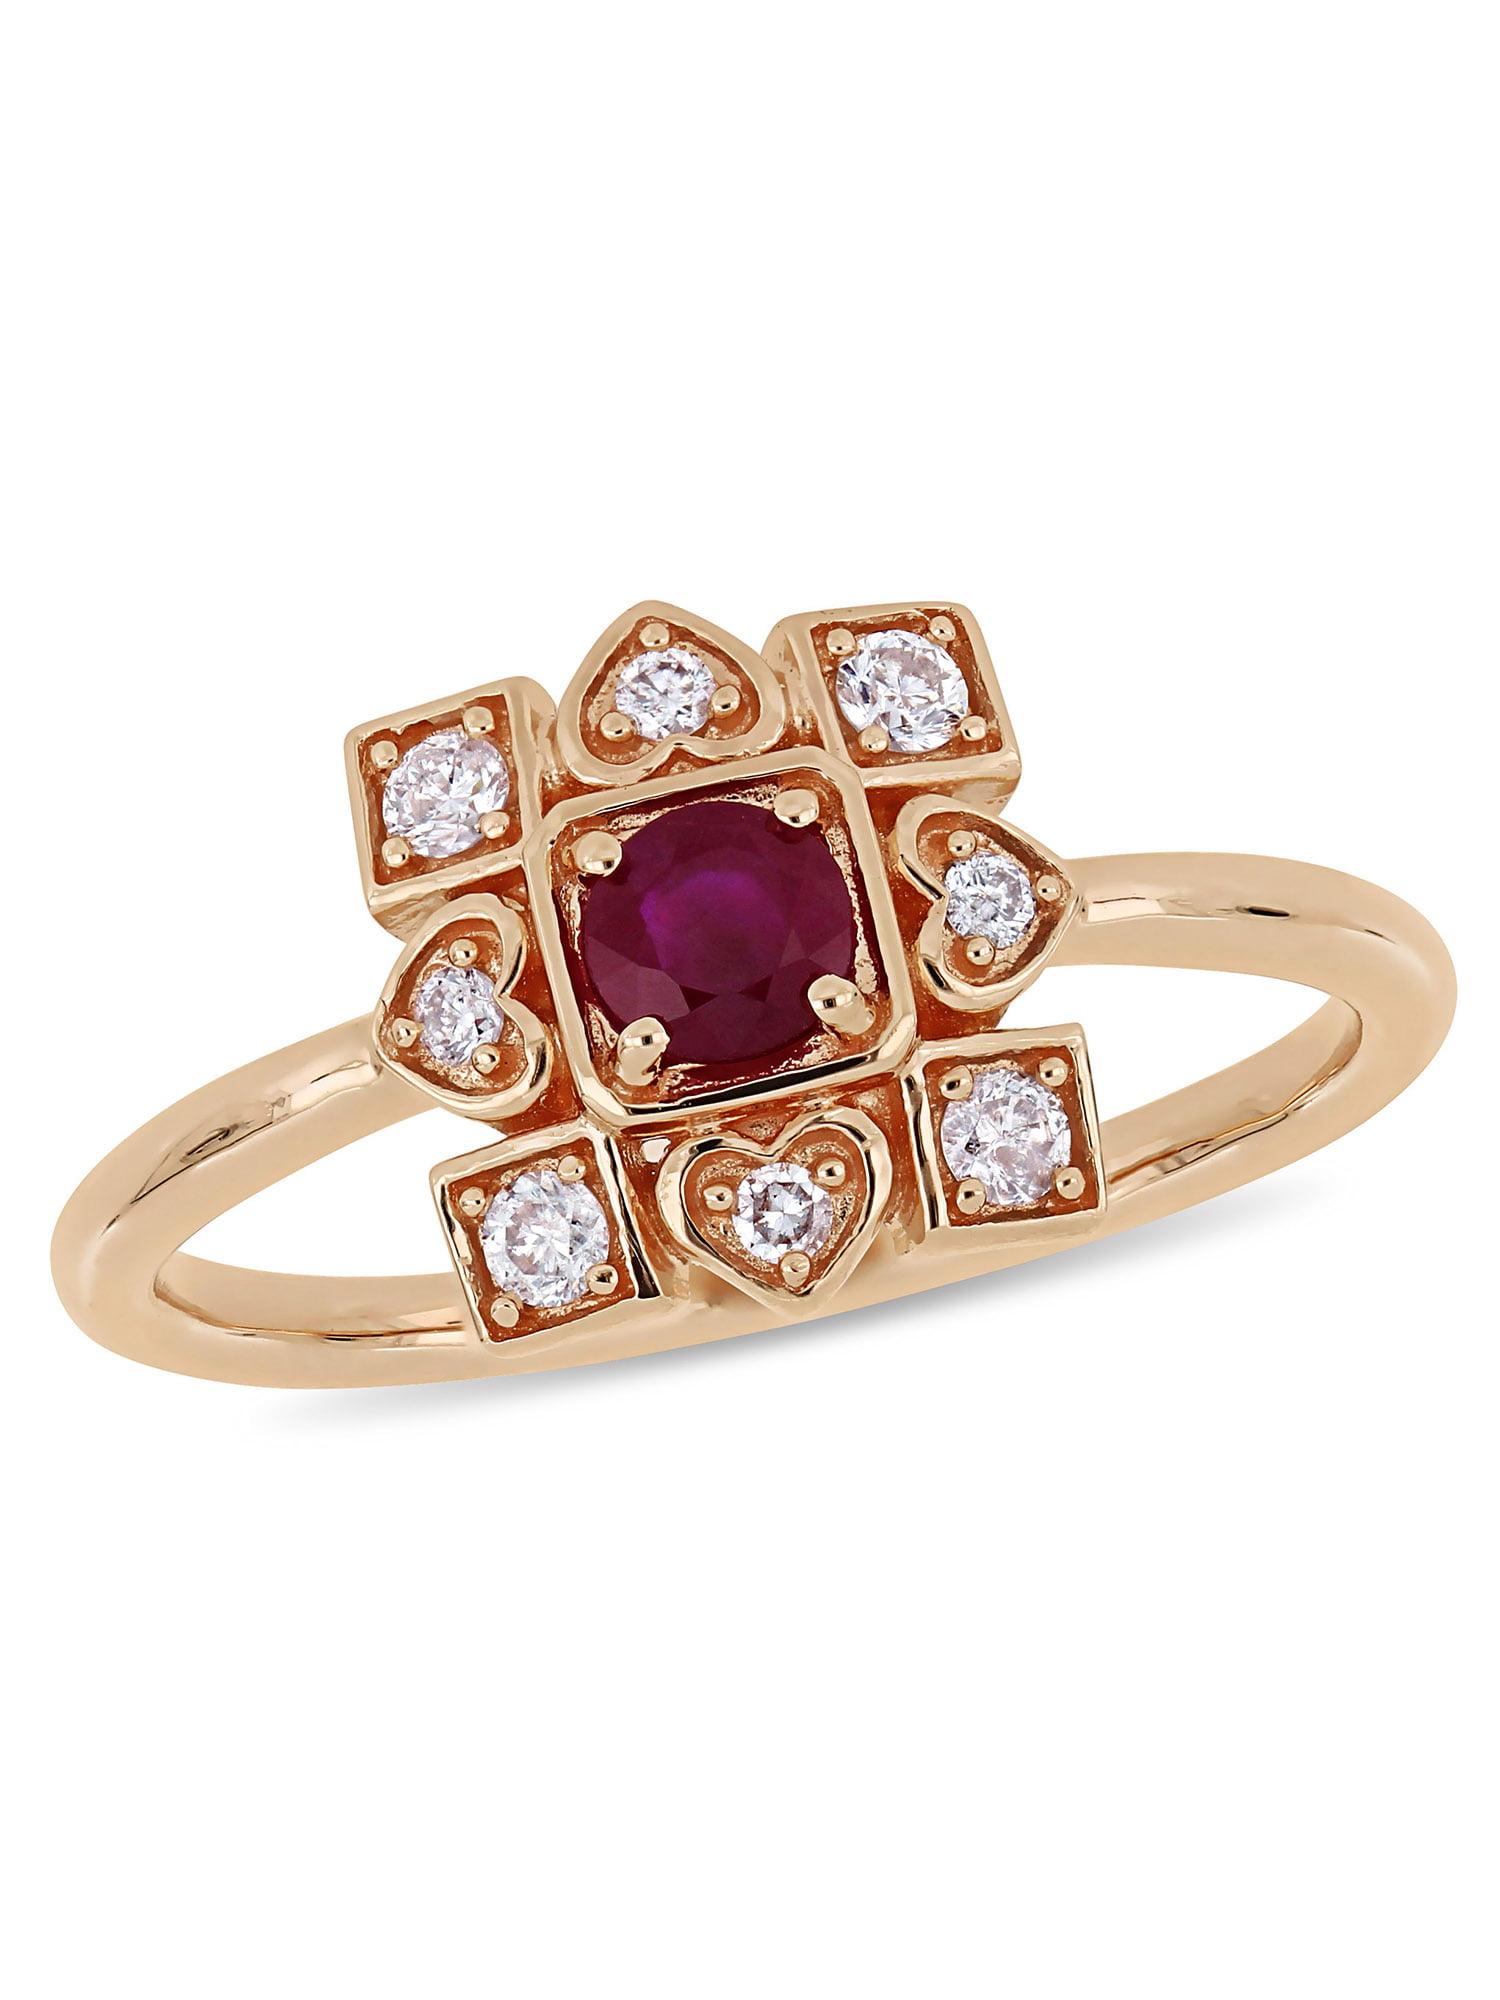 Tangelo 1/3 Carat T.G.W. Ruby and 1/5 Carat T.W. Diamond 10kt Rose Gold Vintage Geometric Ring